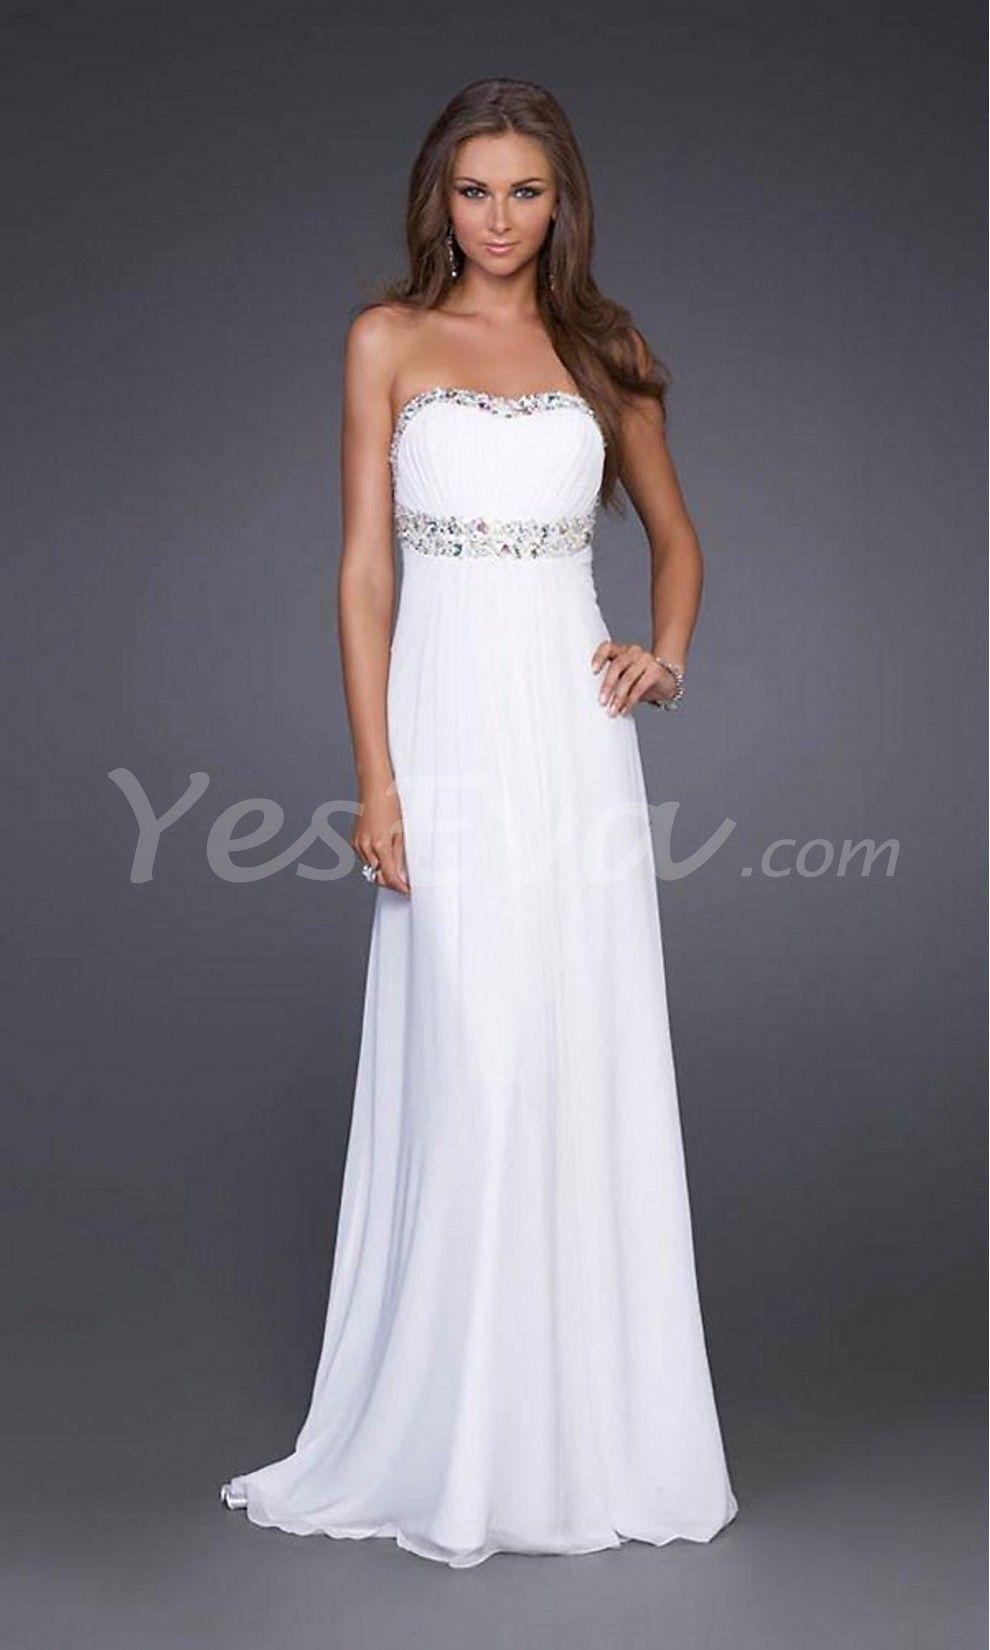 Elegant Strapless Empire Open Back Chiffon Prom Dresses.$149.99